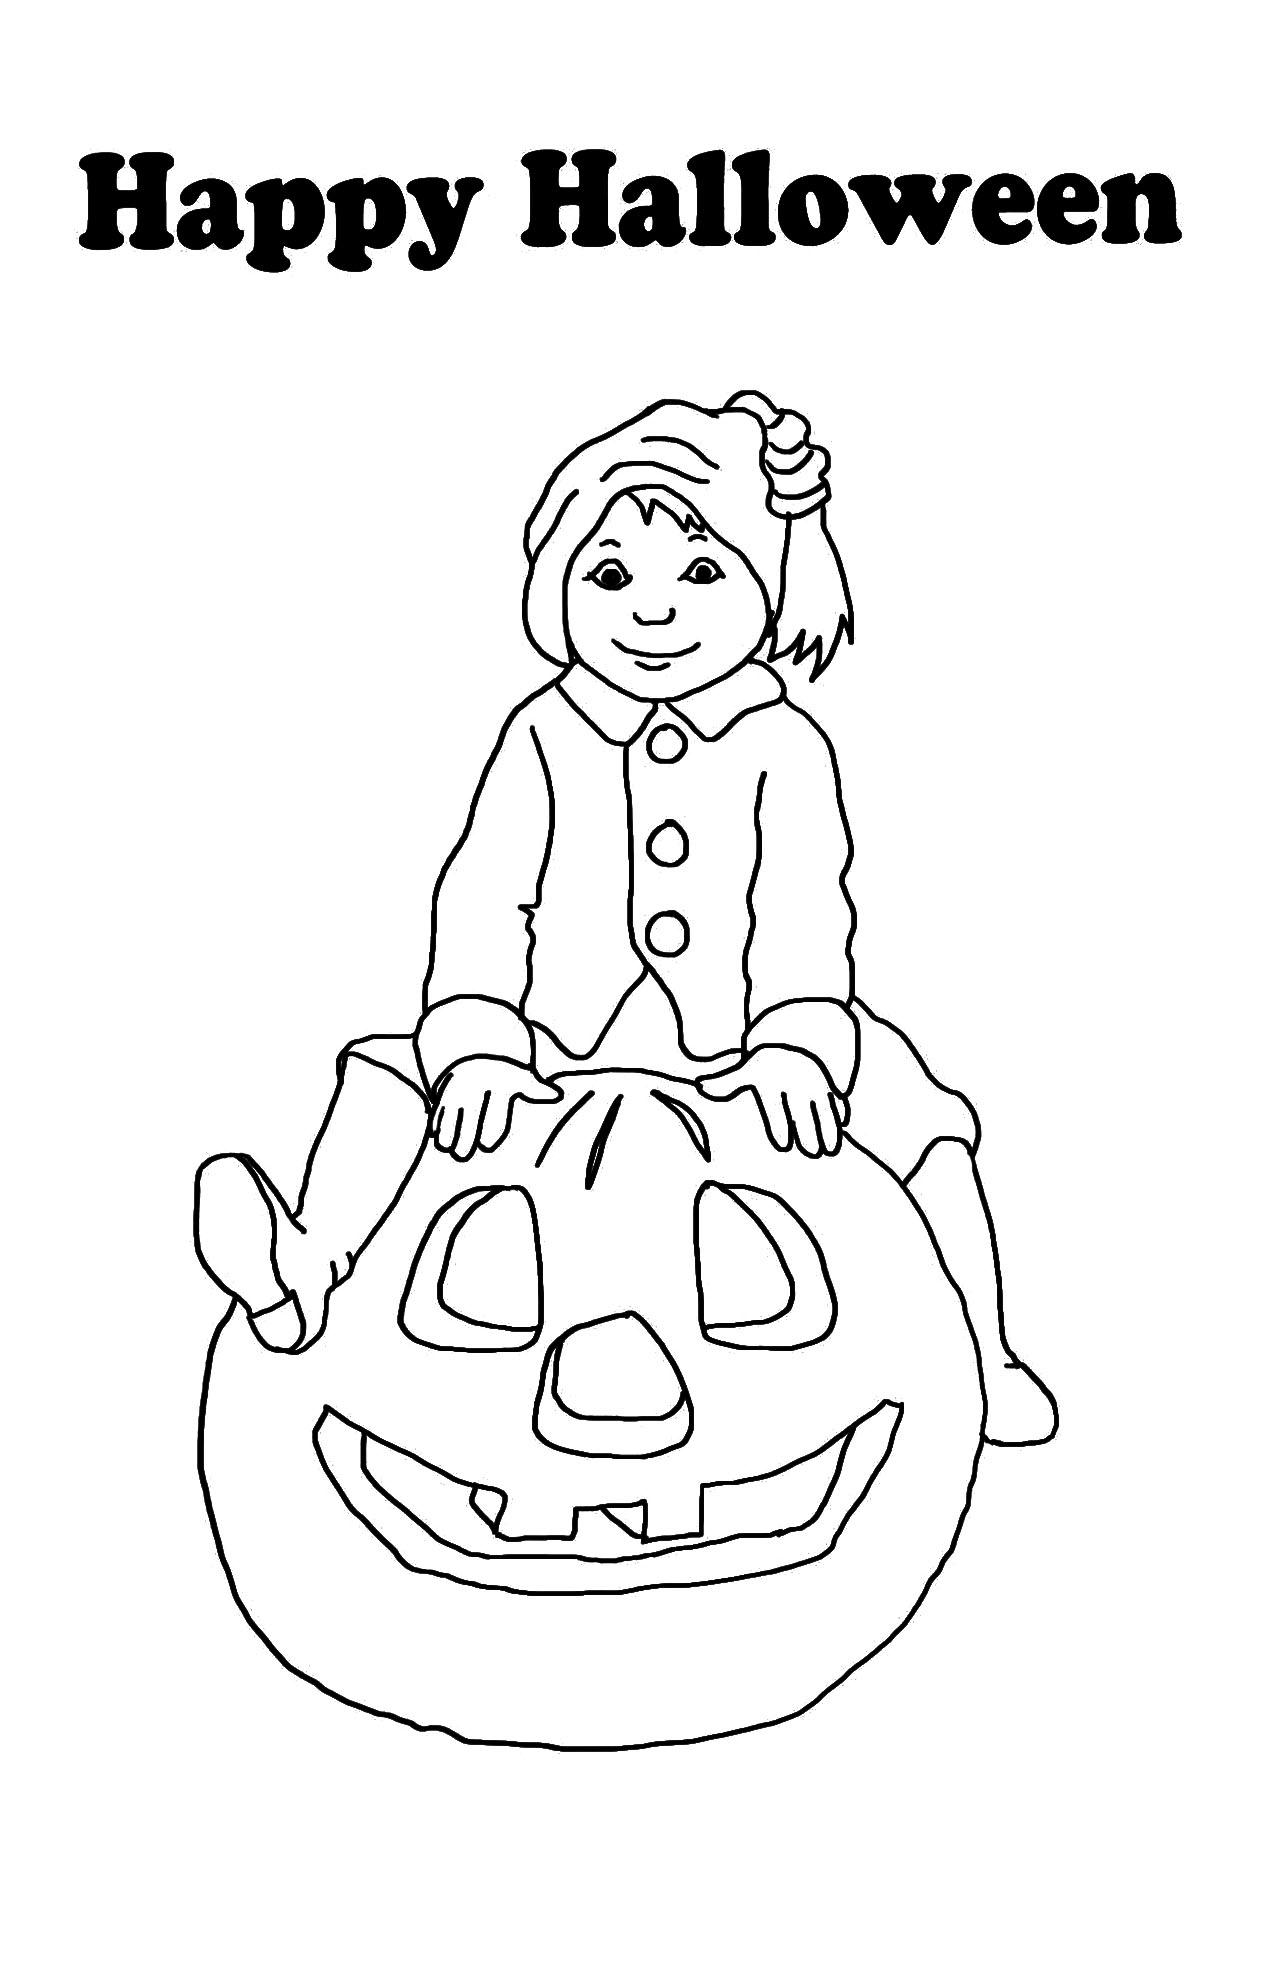 halloween card with boy and pumpkin